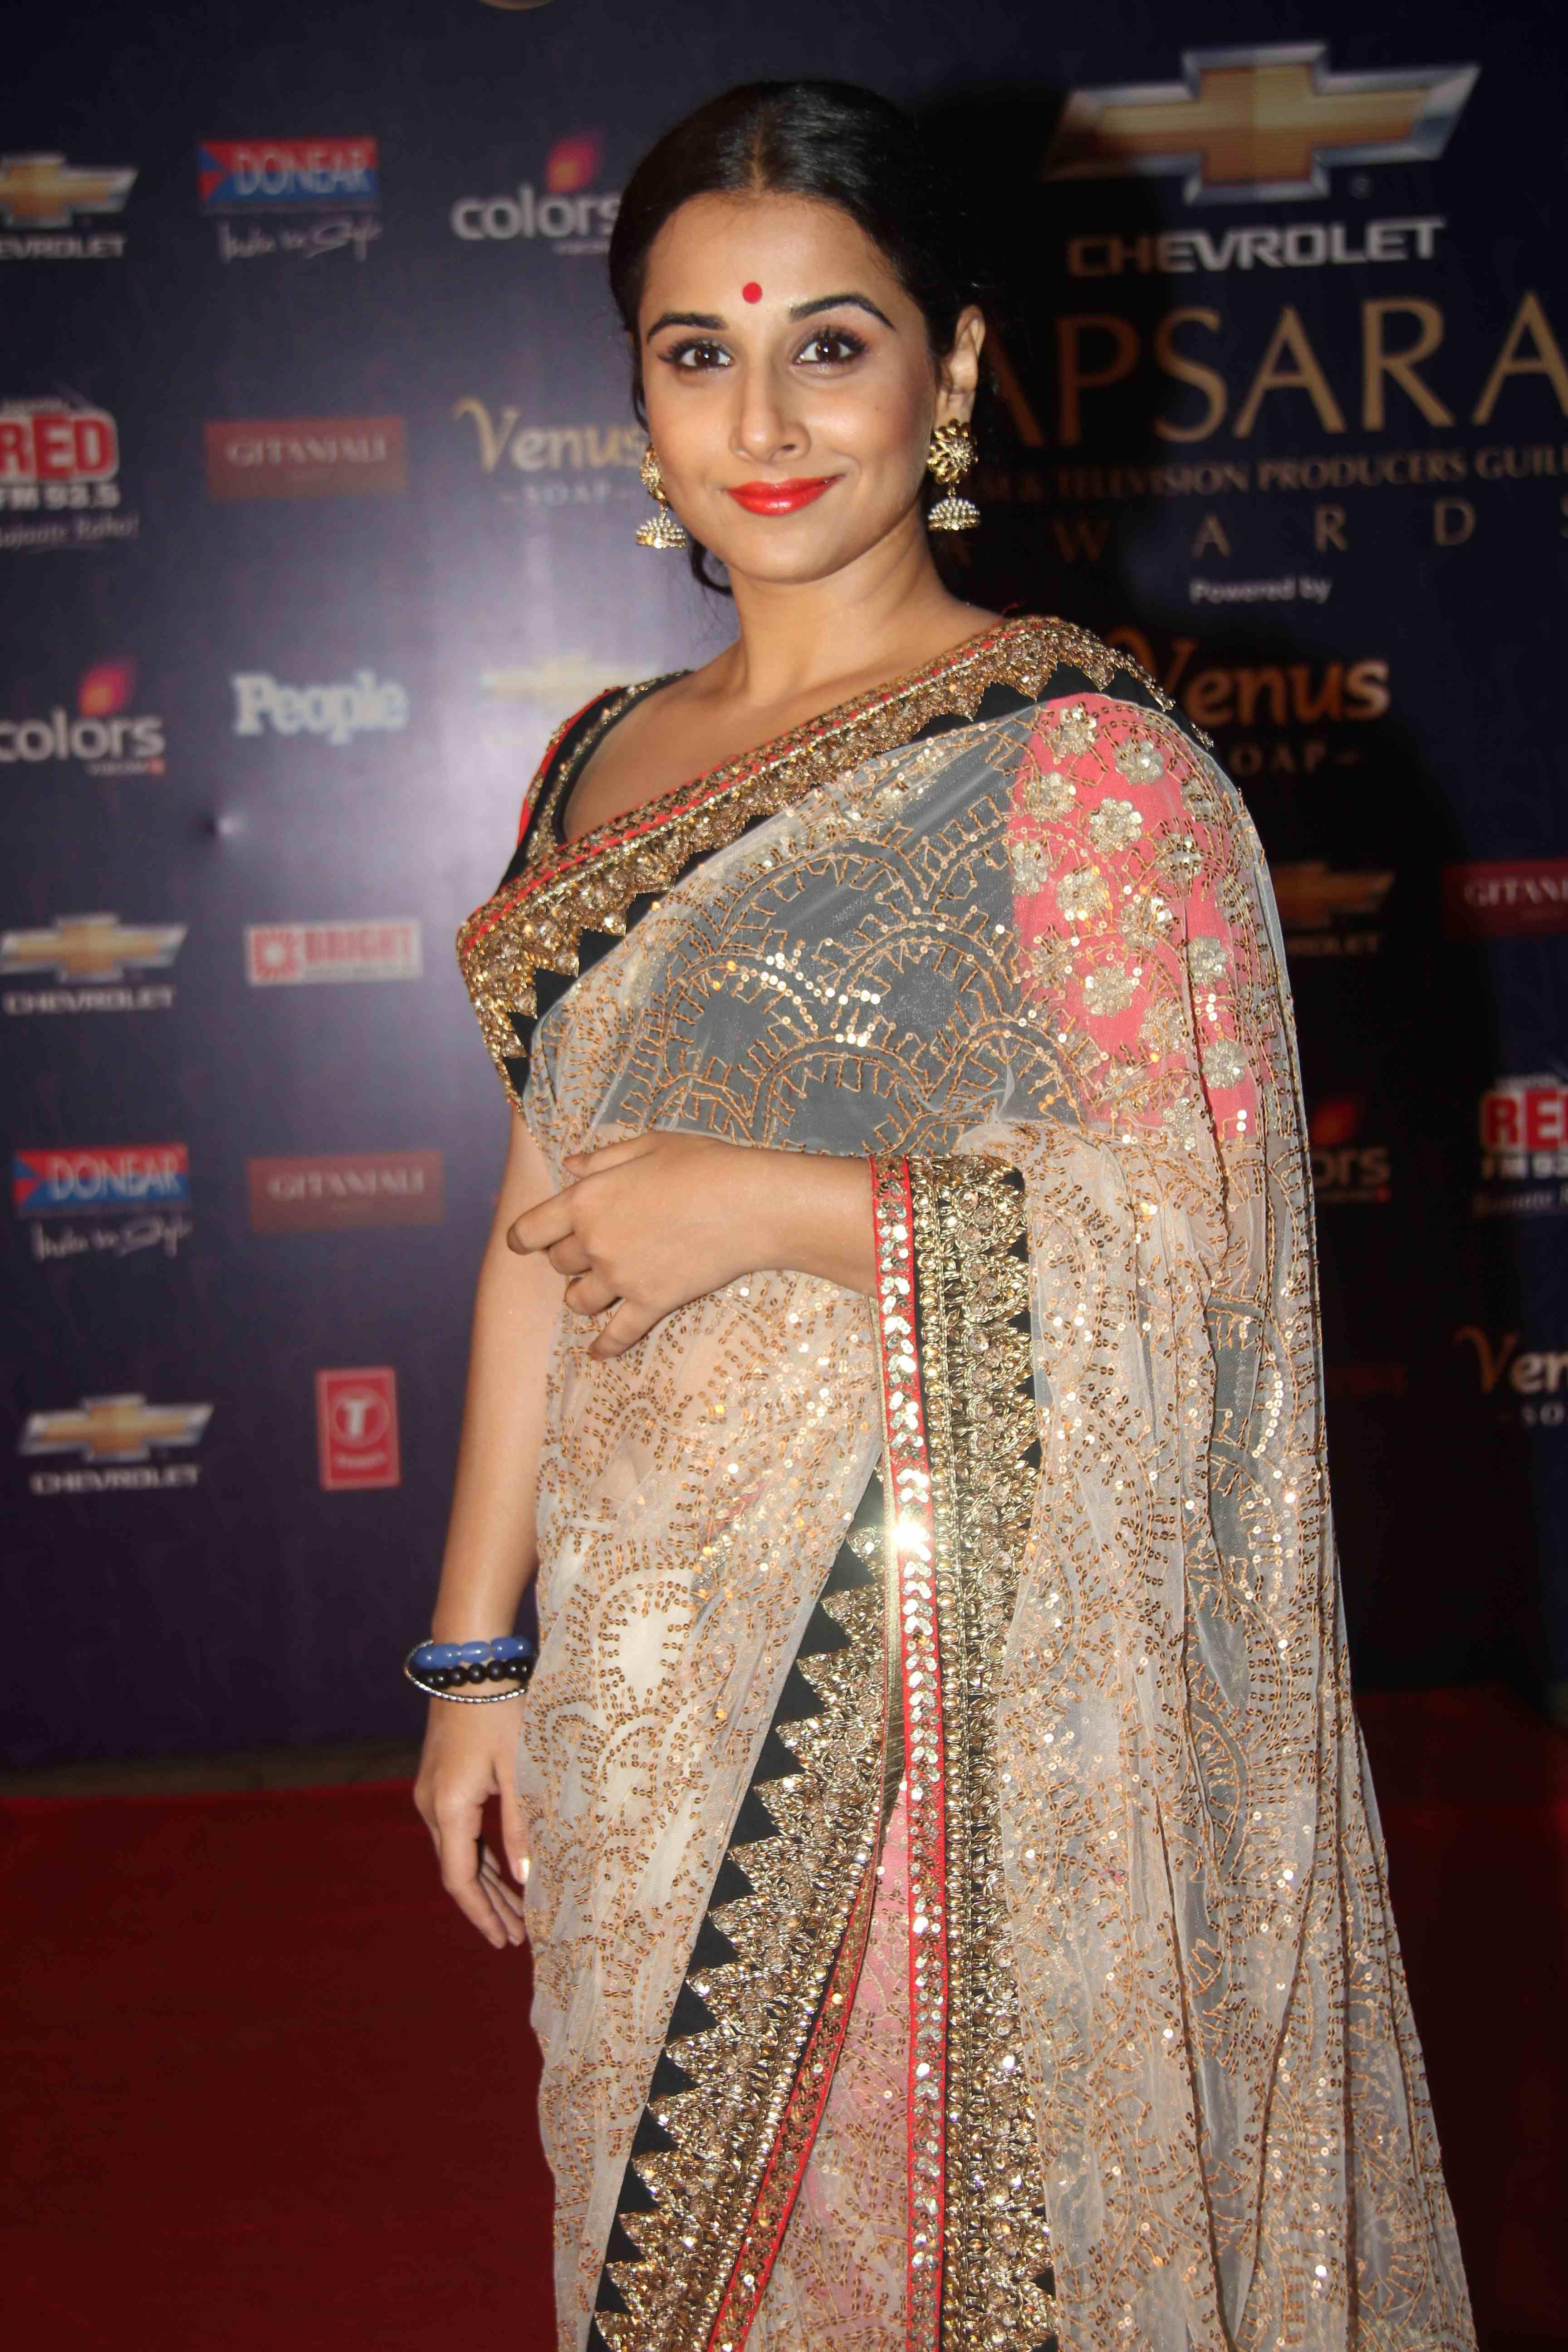 vidya balan hot in saree + other hq unwatermarked pics | vidya